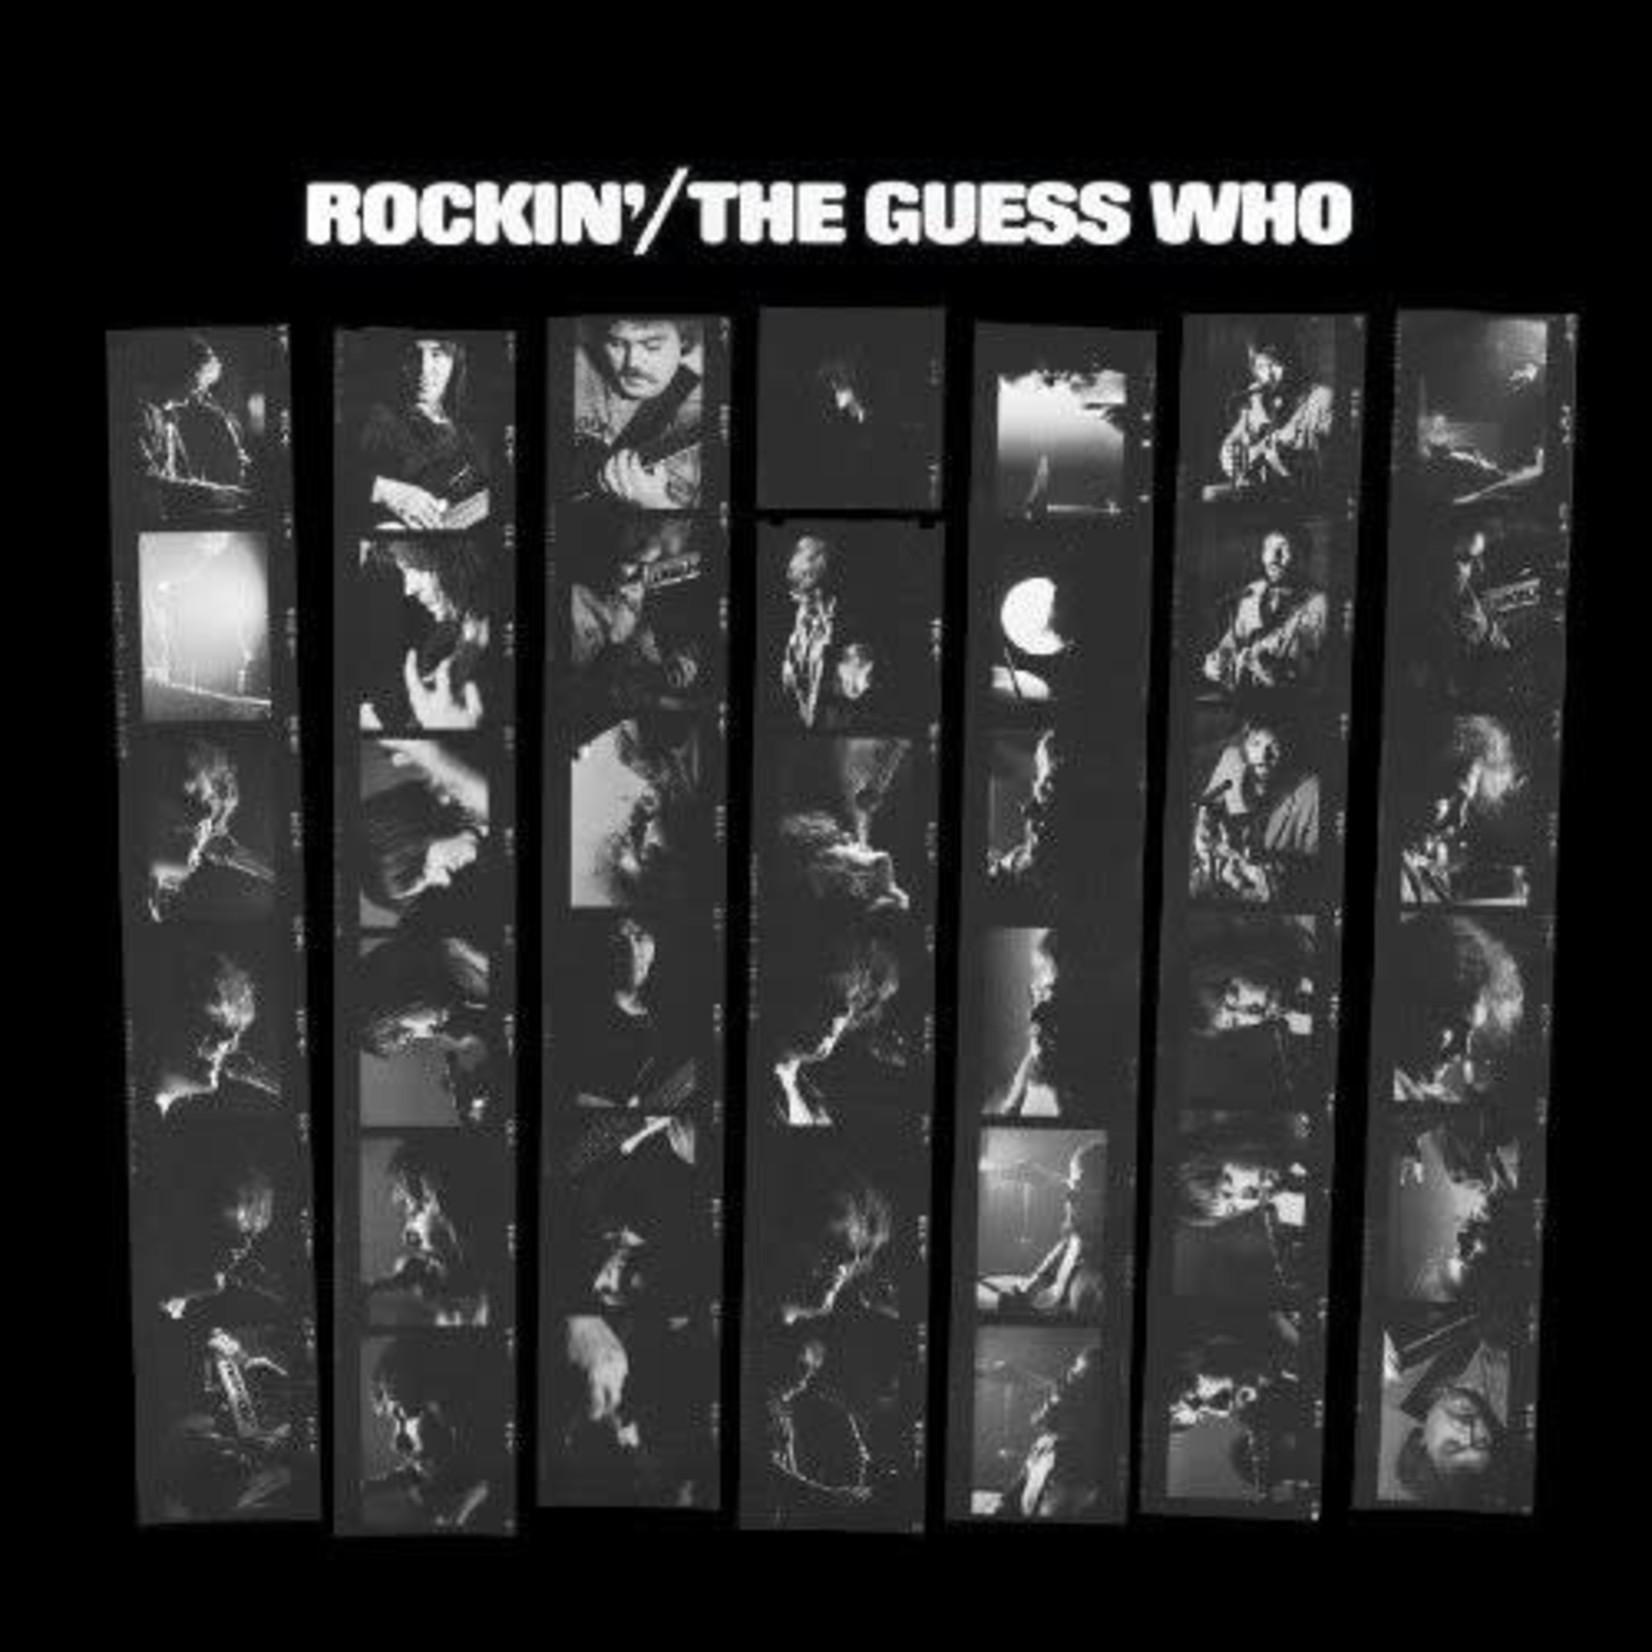 [Vintage] Guess Who: Rockin